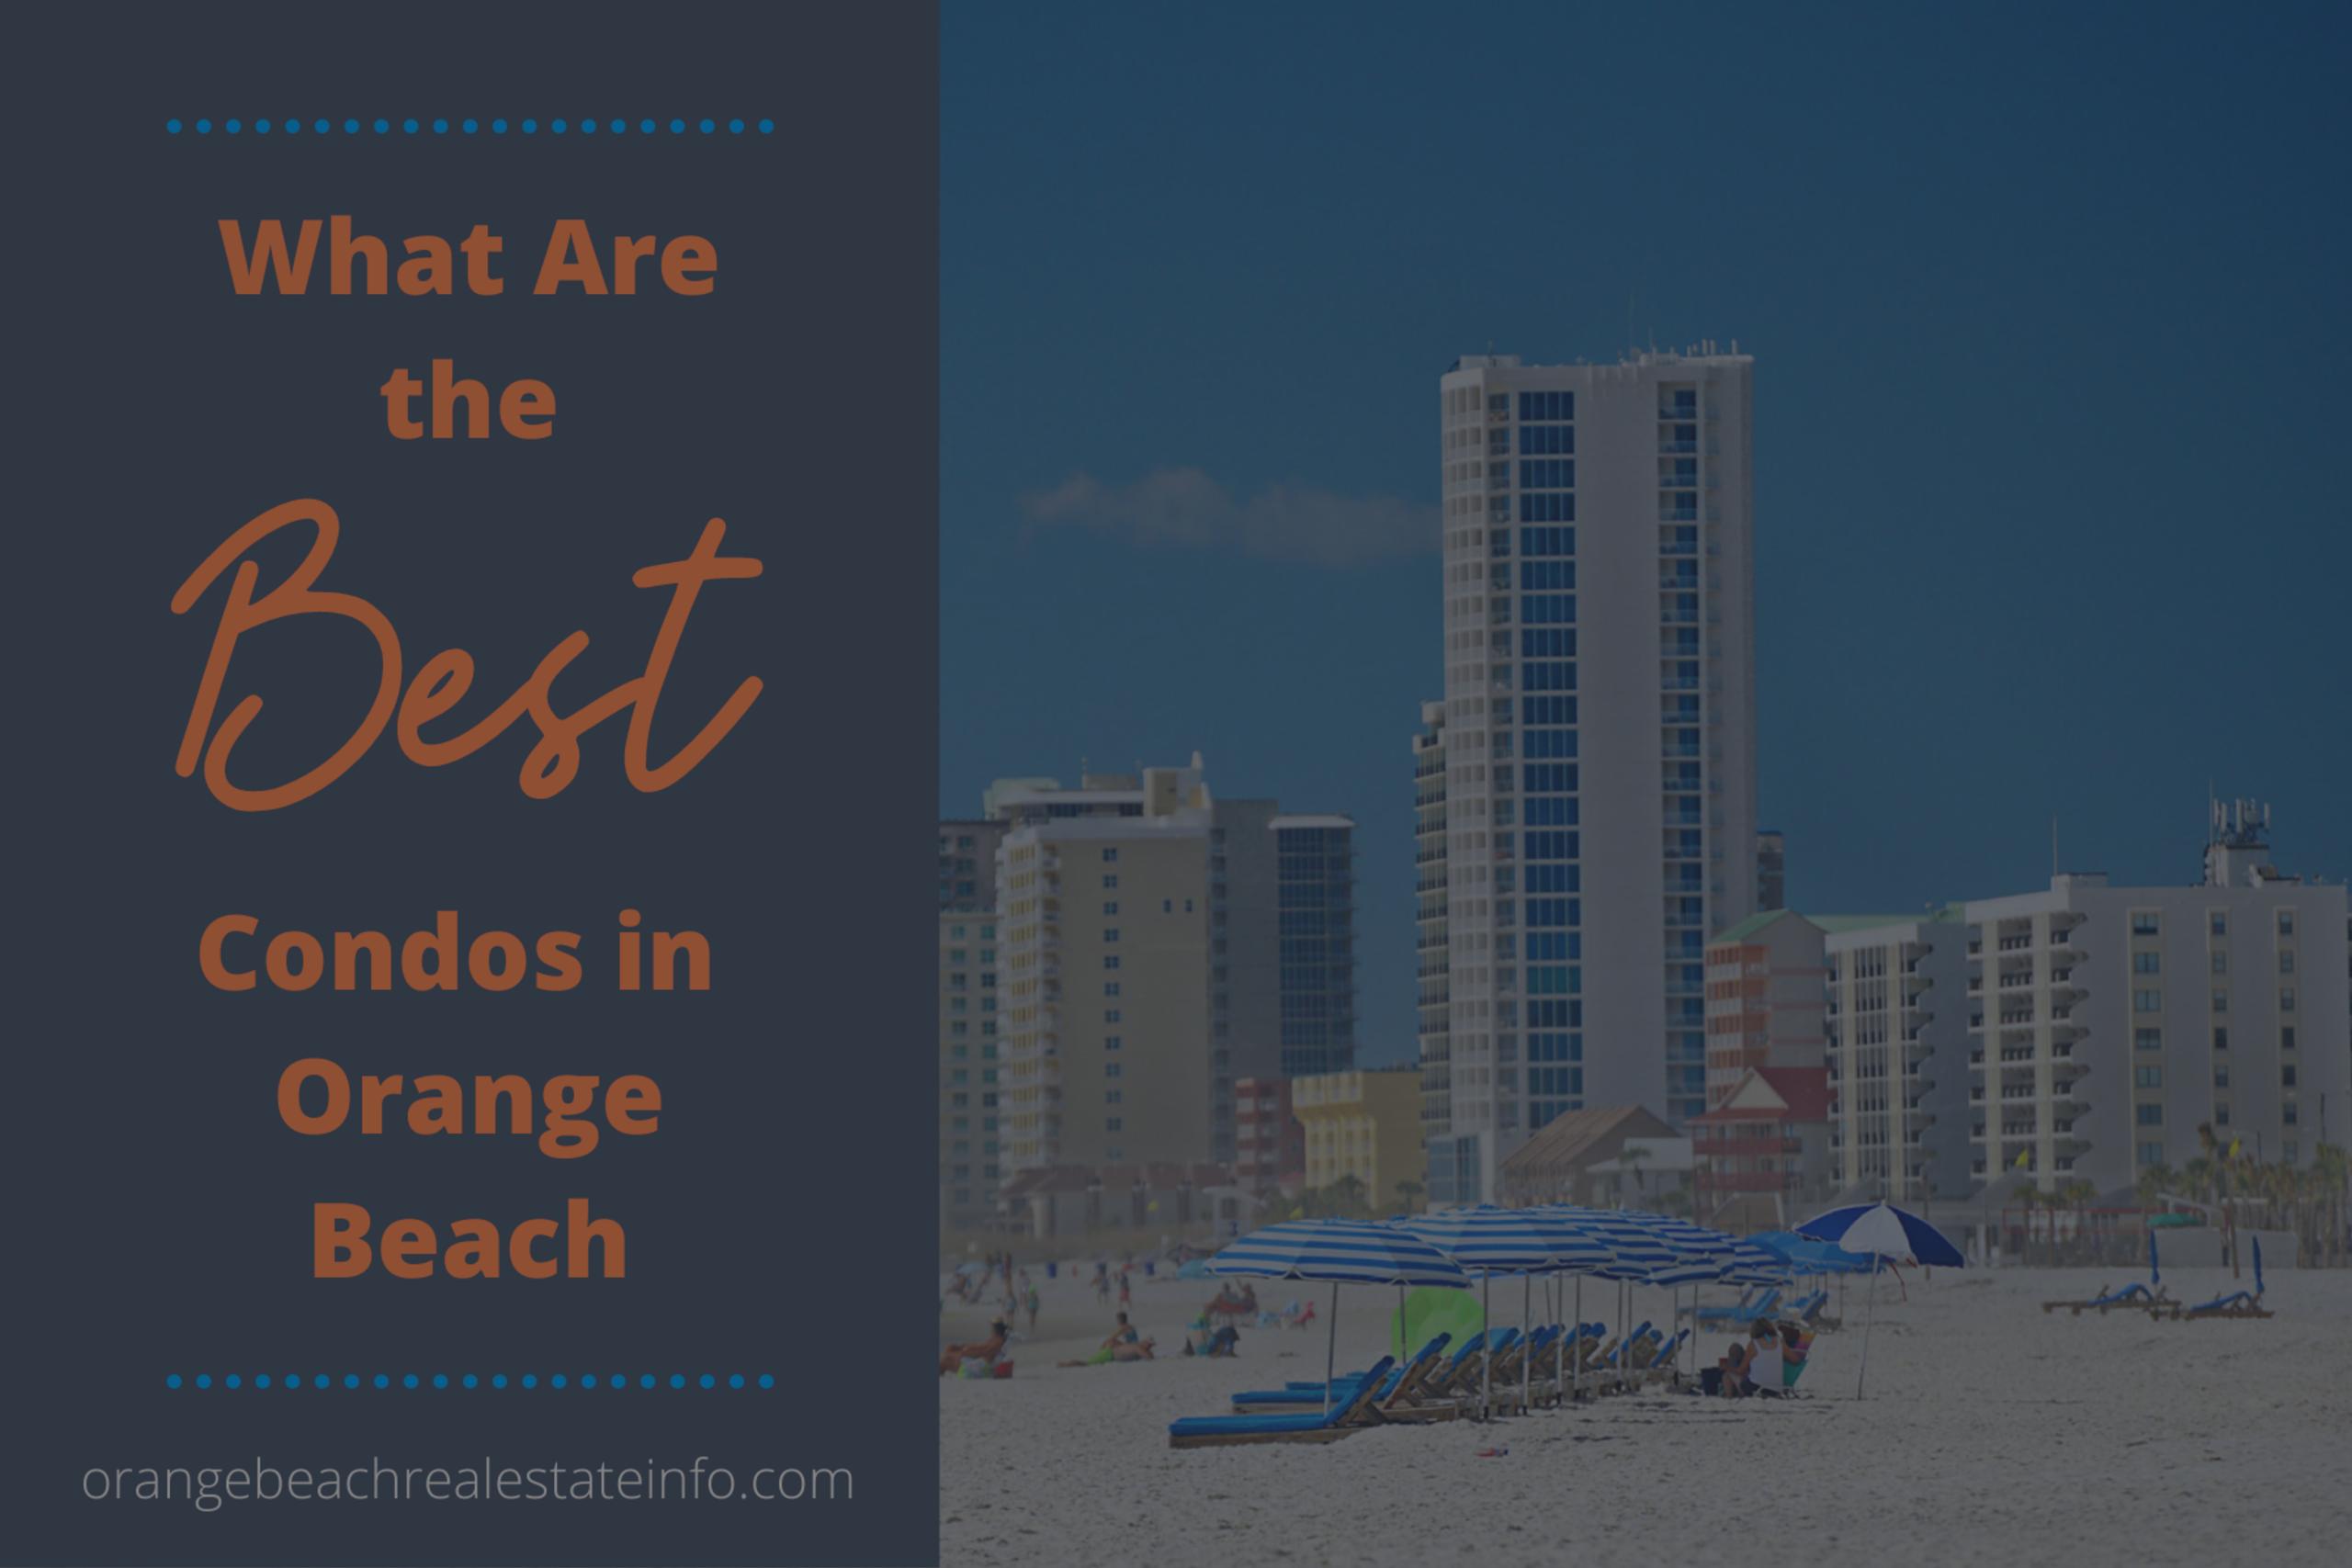 What Are the Best Condos in Orange Beach?